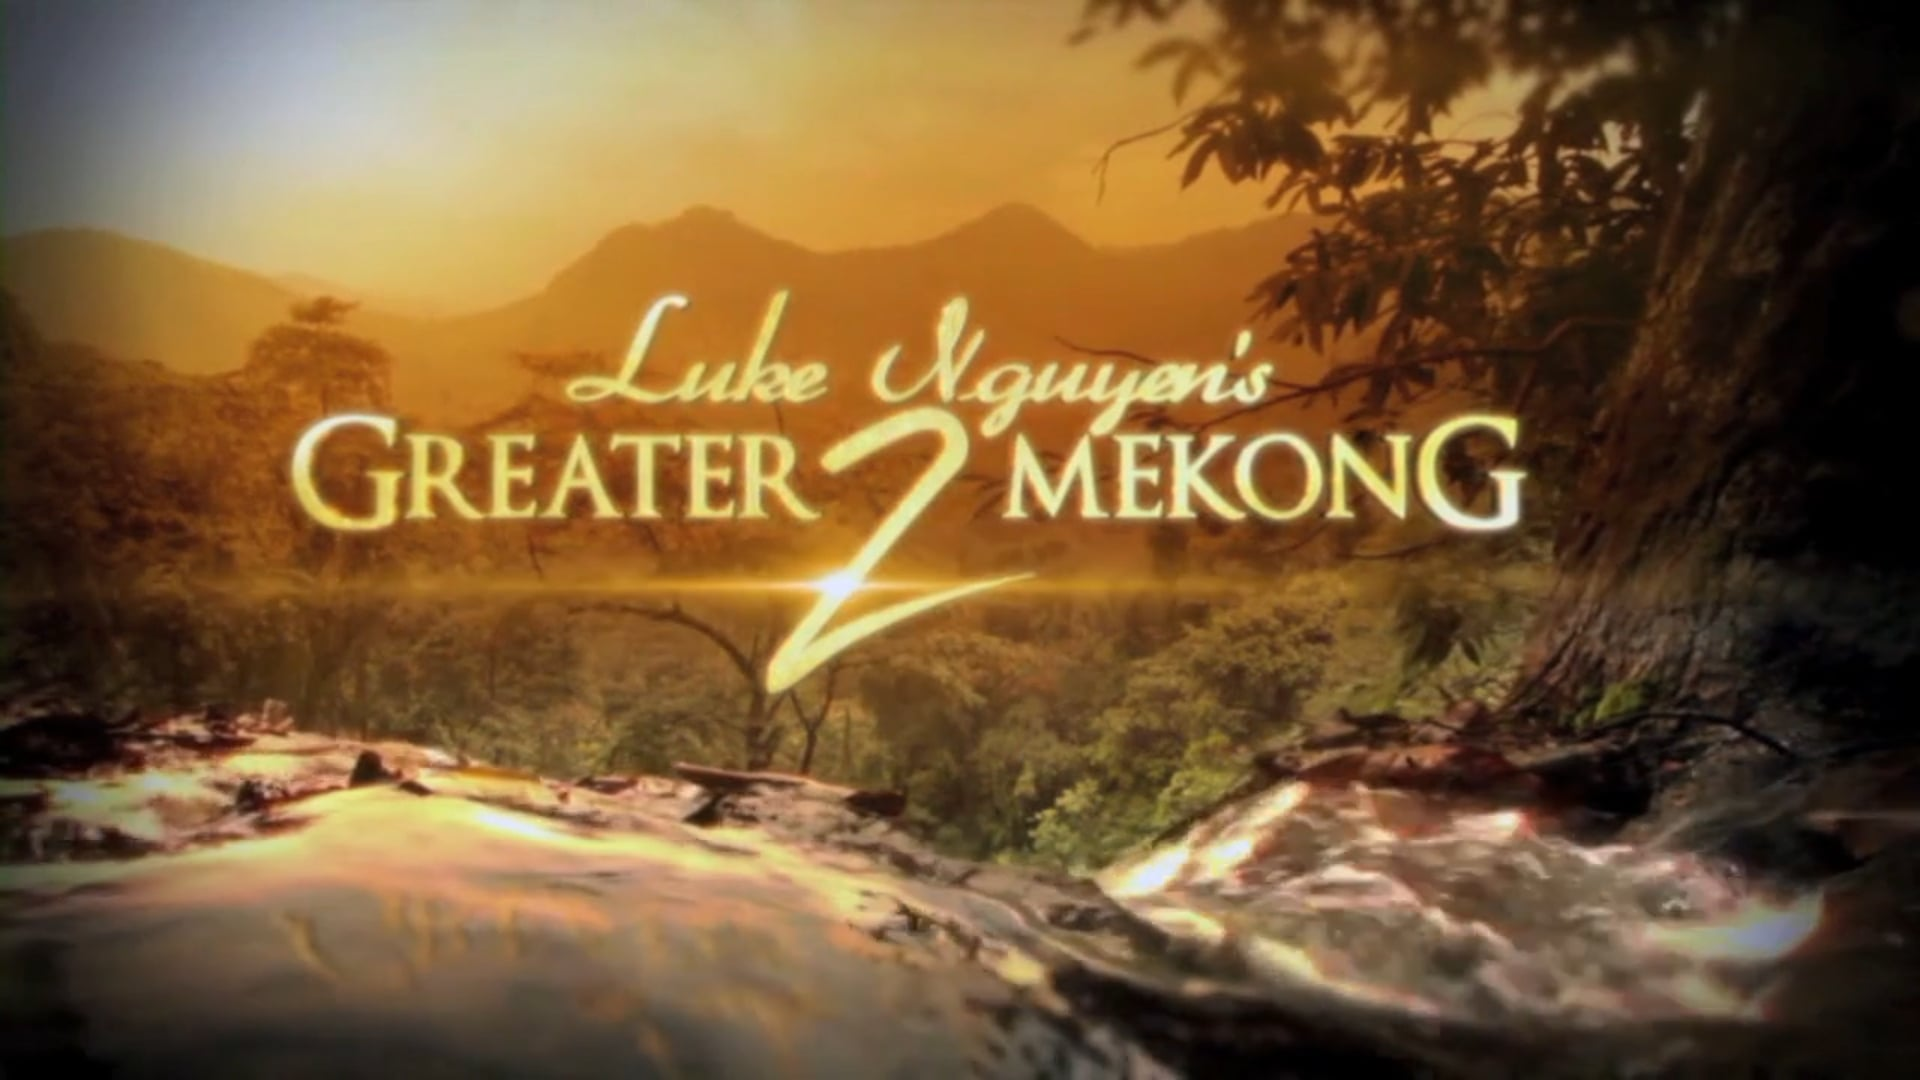 (SBS) Luke Nguyen's Greater Mekong 2 - Opening Titles